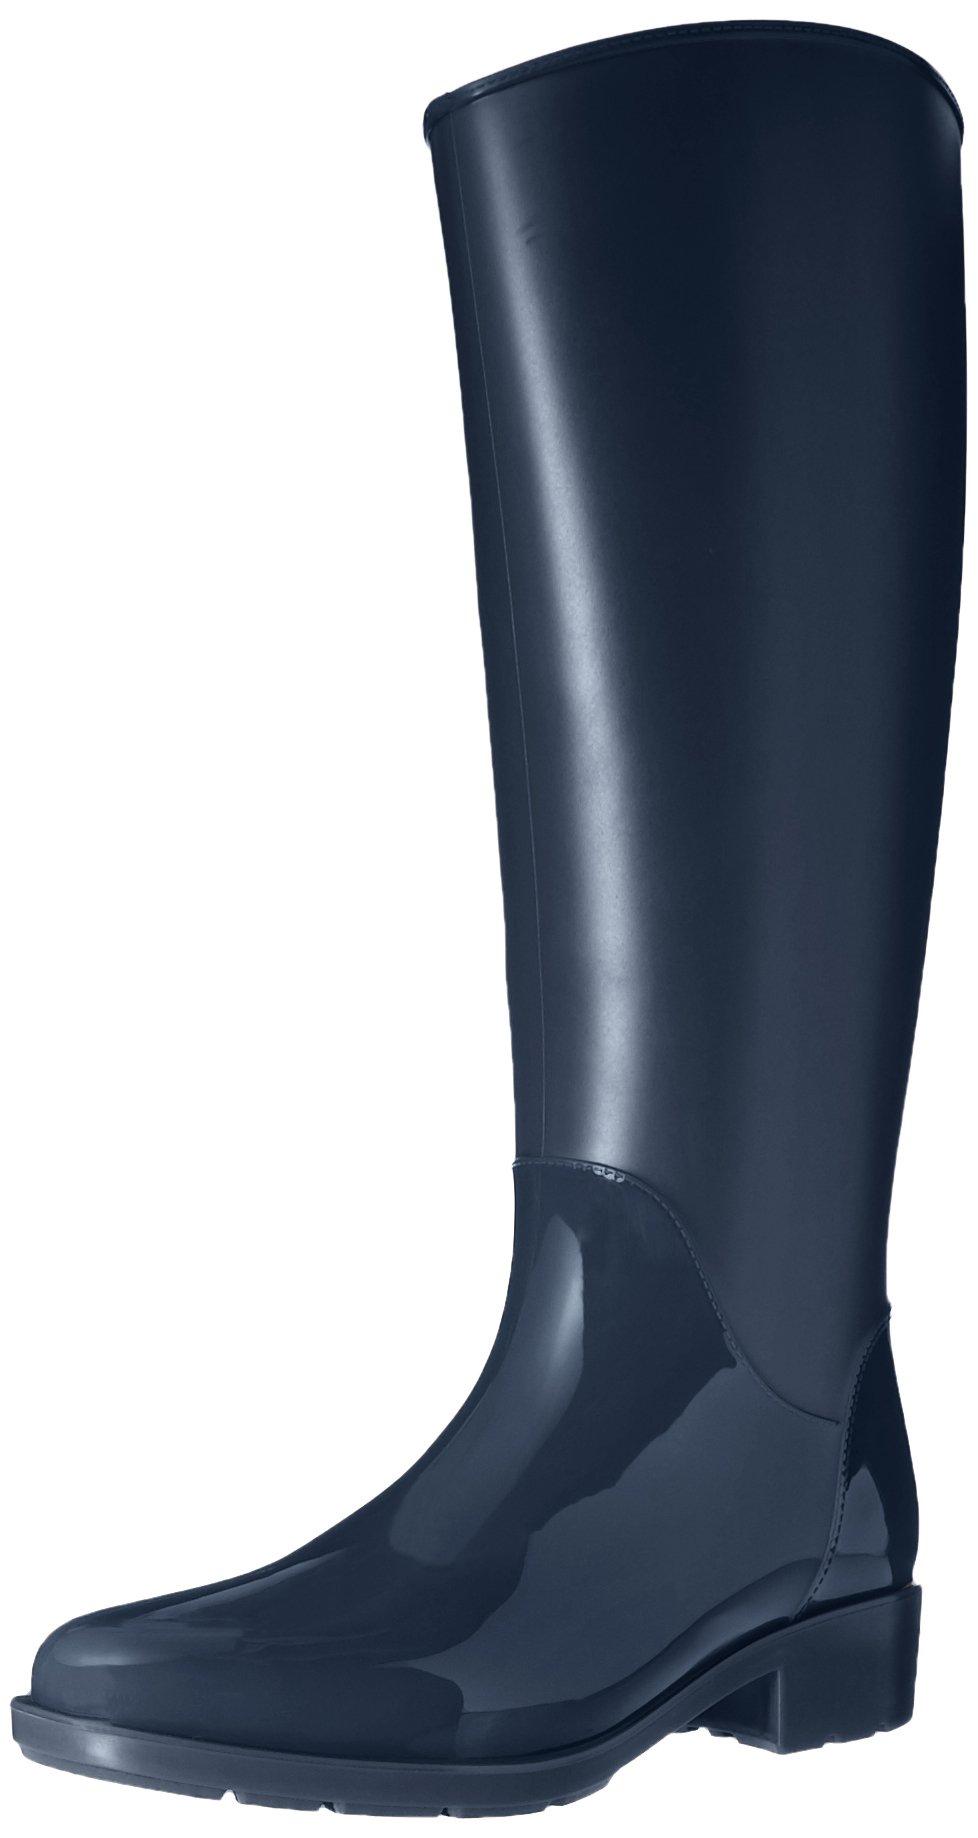 Sam Edelman Women's Sydney Rain Boot, Eclipse Navy, 7 M US